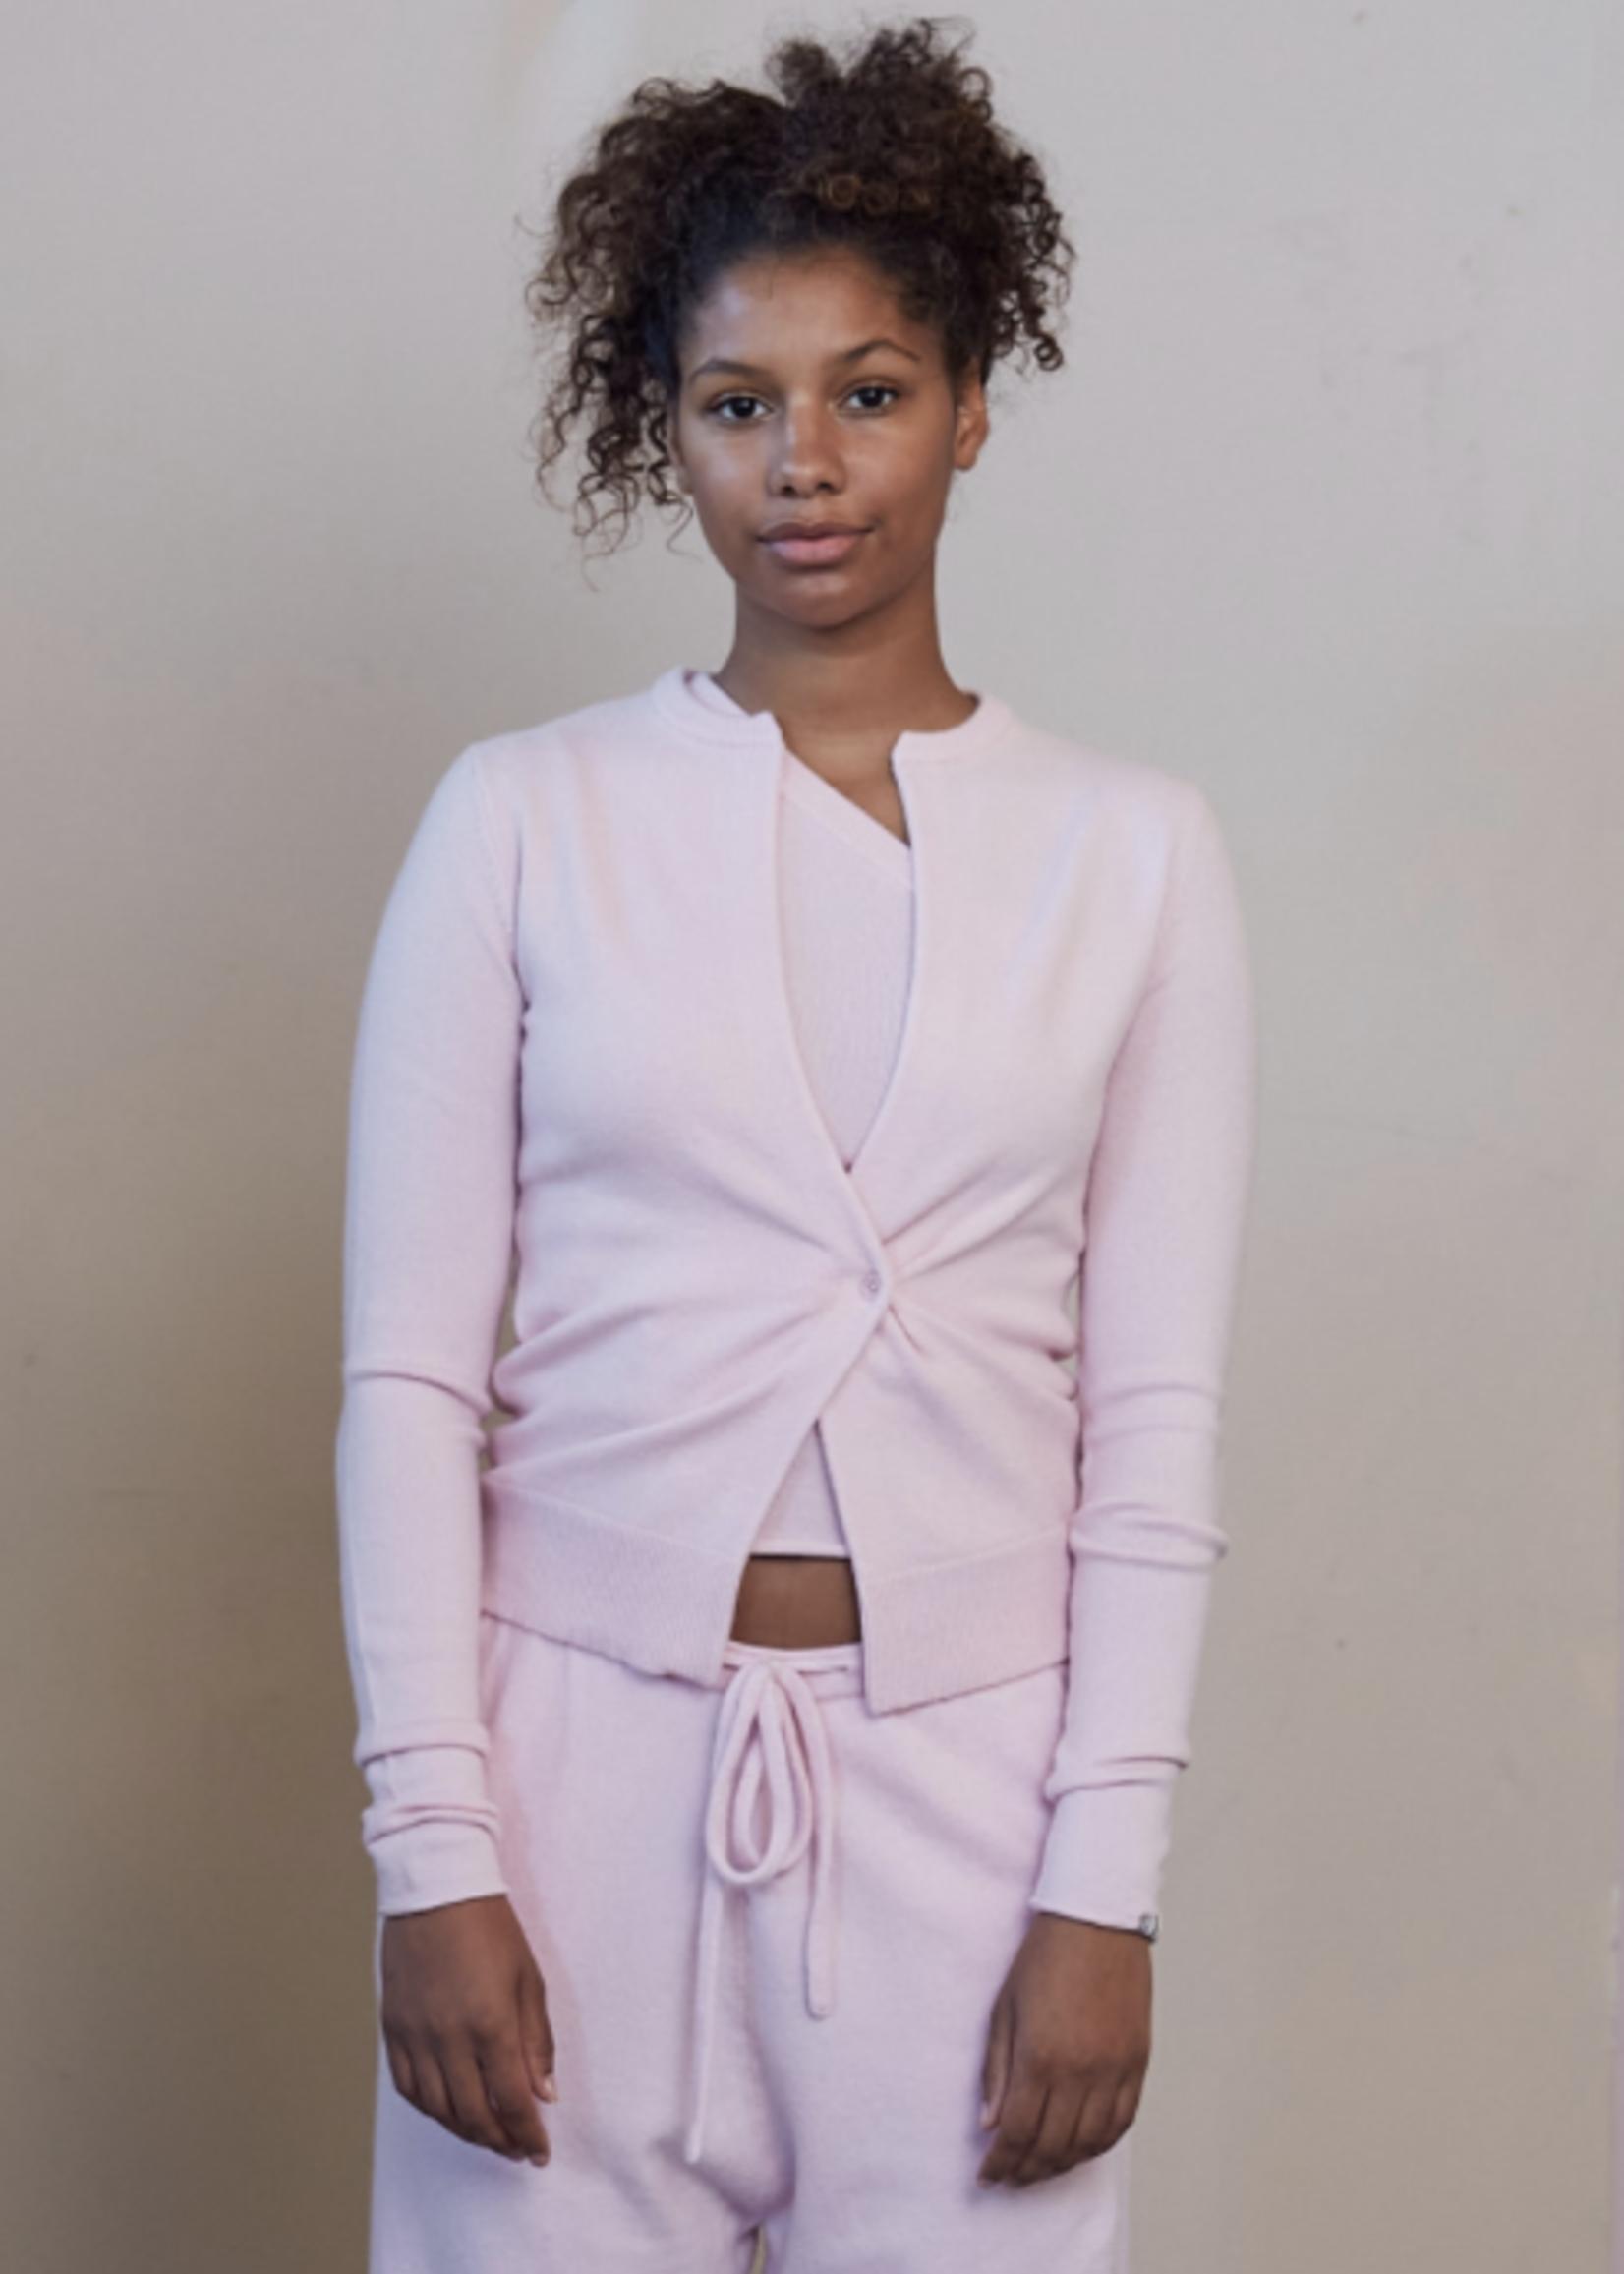 extremecashmere x Extreme cashmere x geisha mallow pink vest